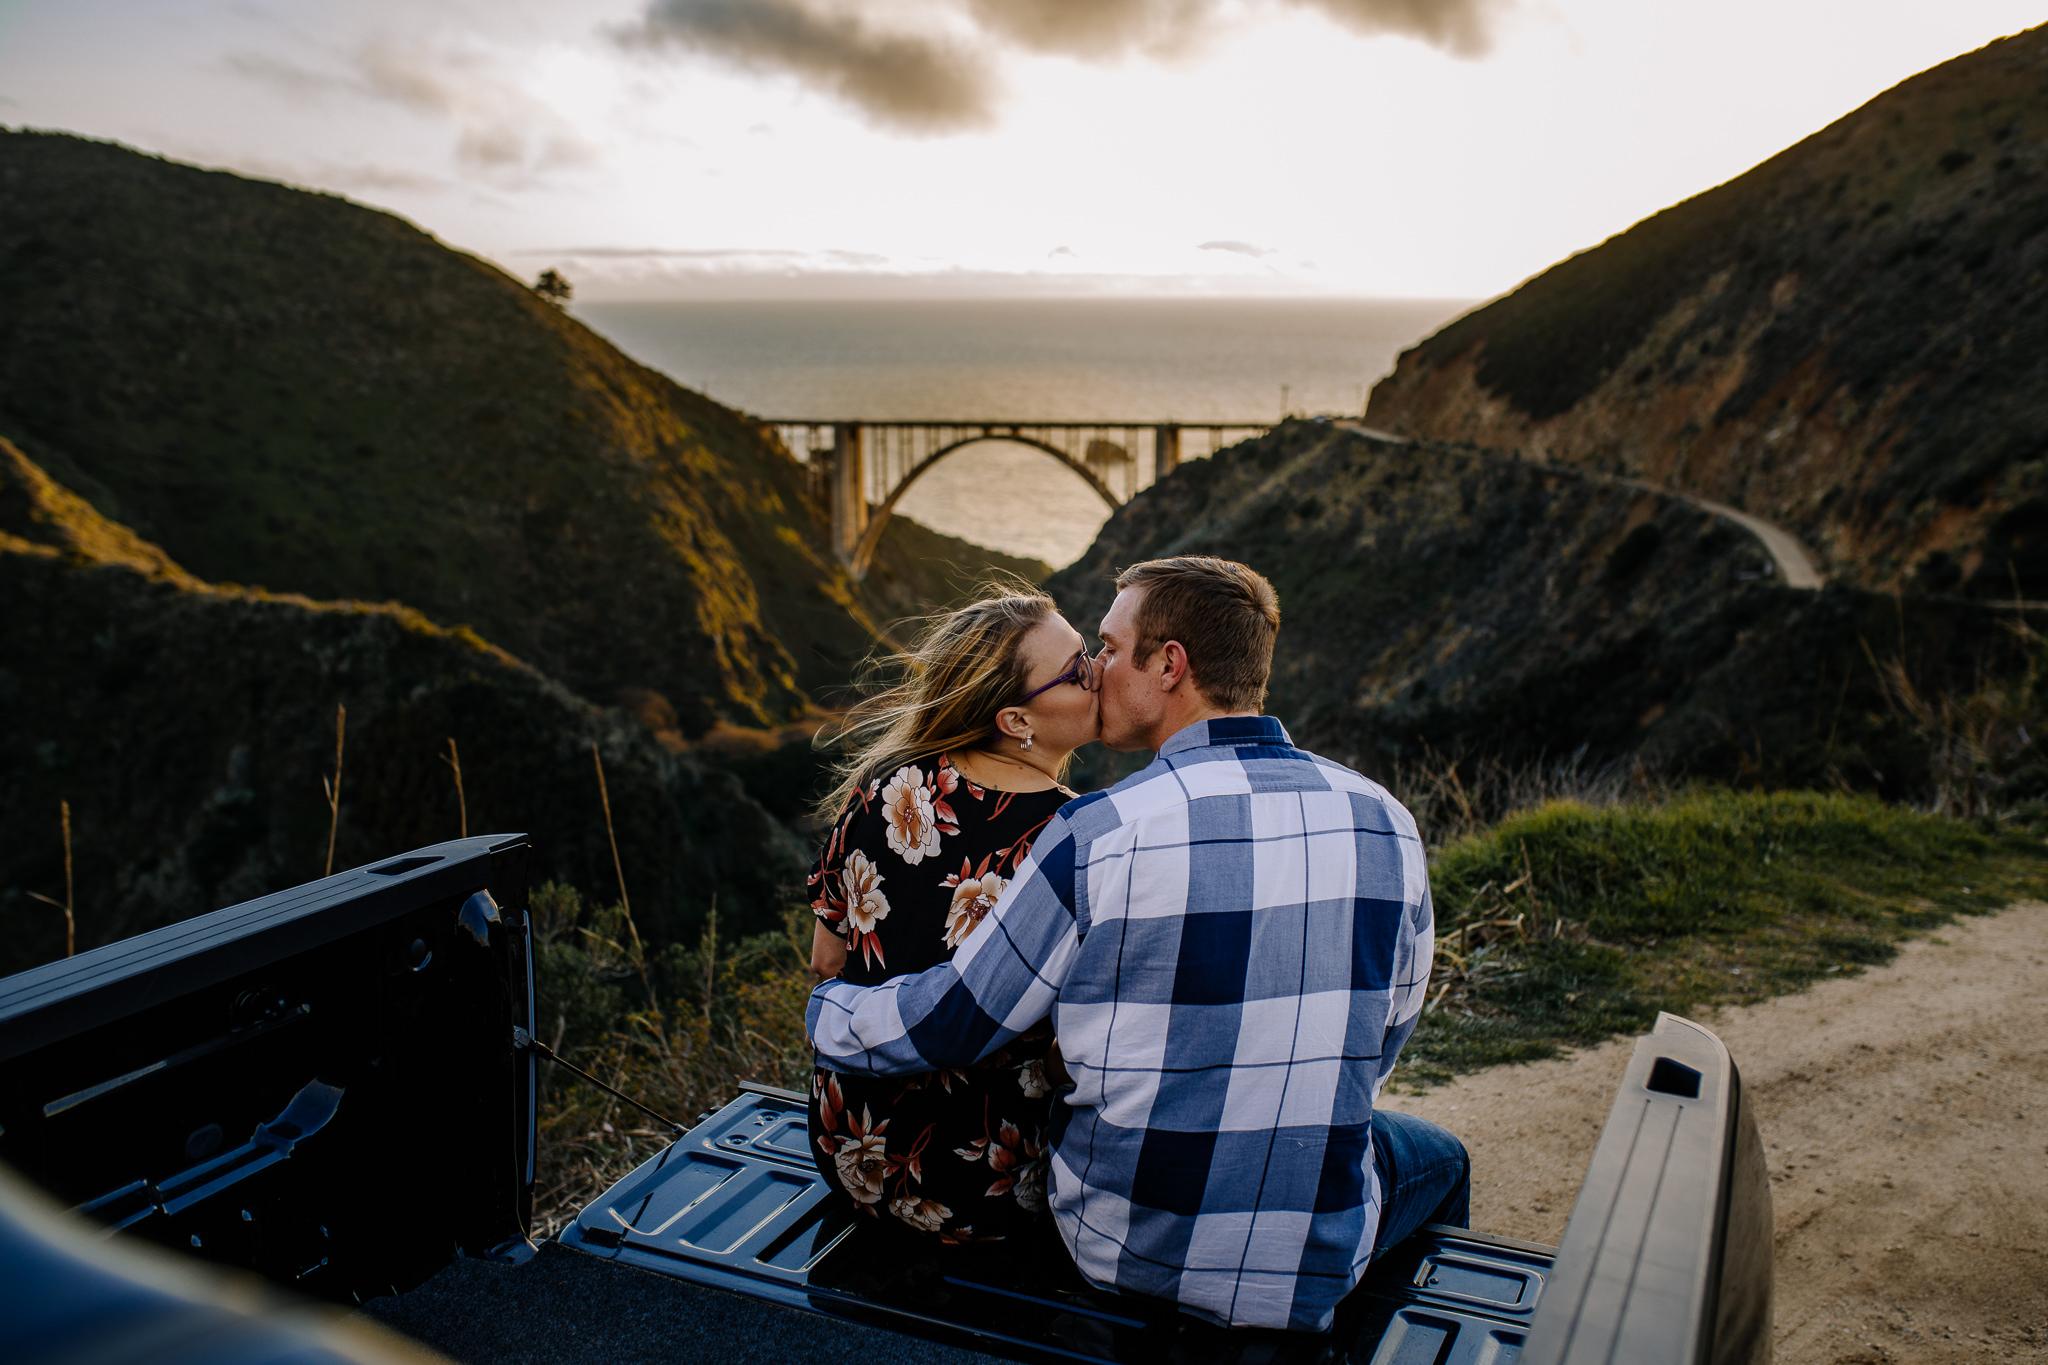 Archer Inspired Photography Michelle JJ Big Sur Wedding Engagement California Central Coast Lifestyle Documentary Photographer-22.jpg